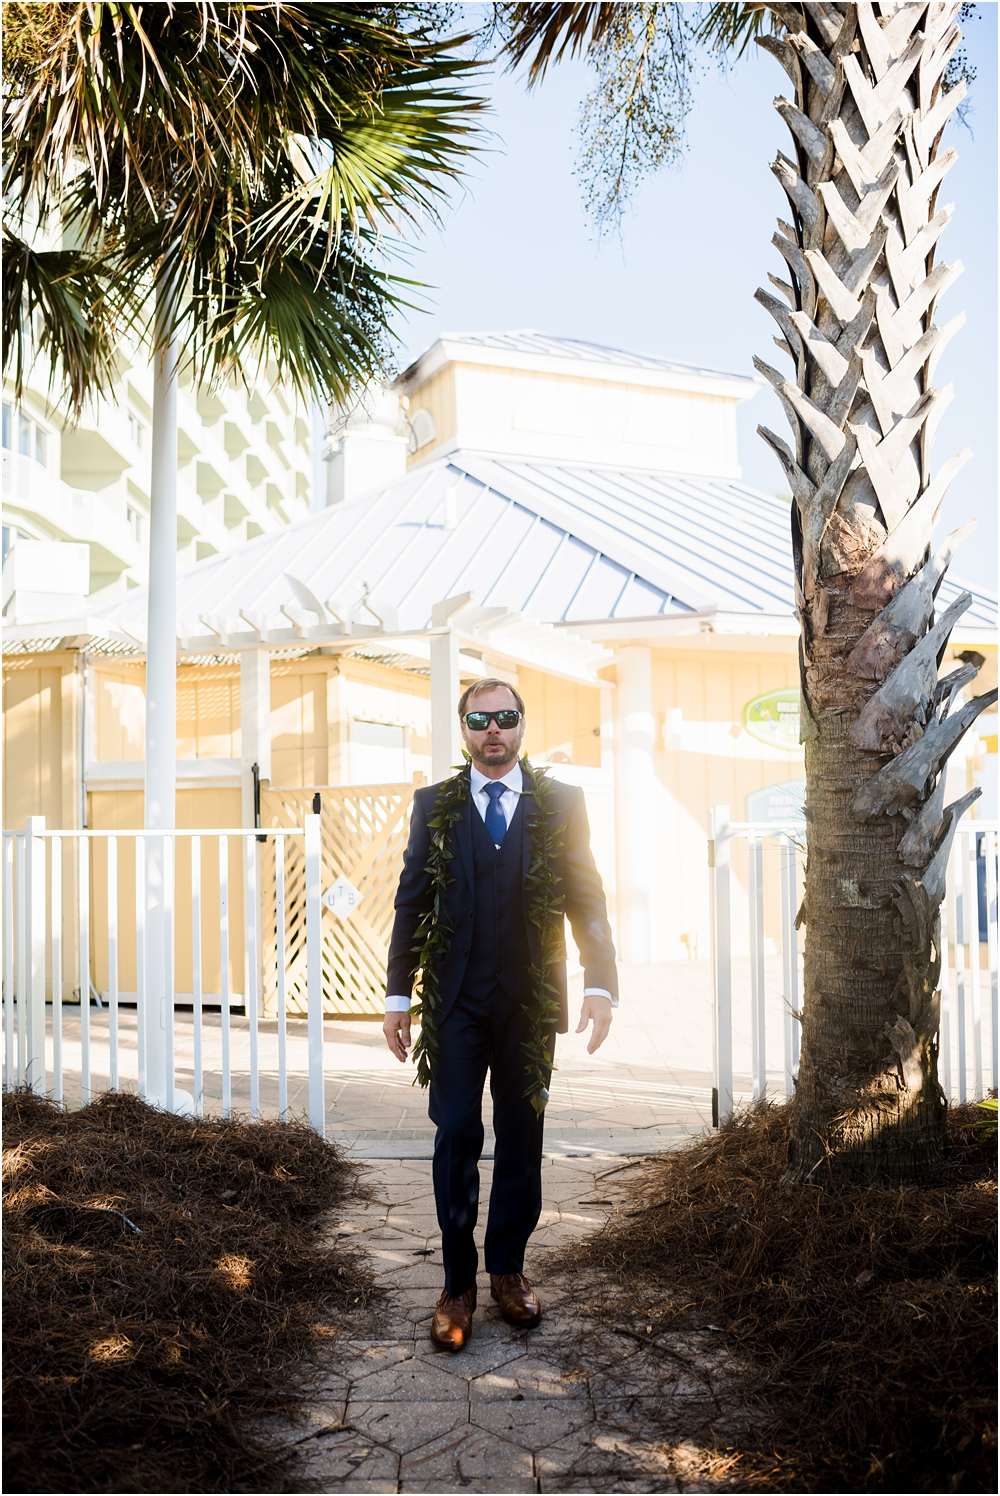 ledman-wedding-kiersten-stevenson-photography-30a-panama-city-beach-dothan-tallahassee-(131-of-763).JPG